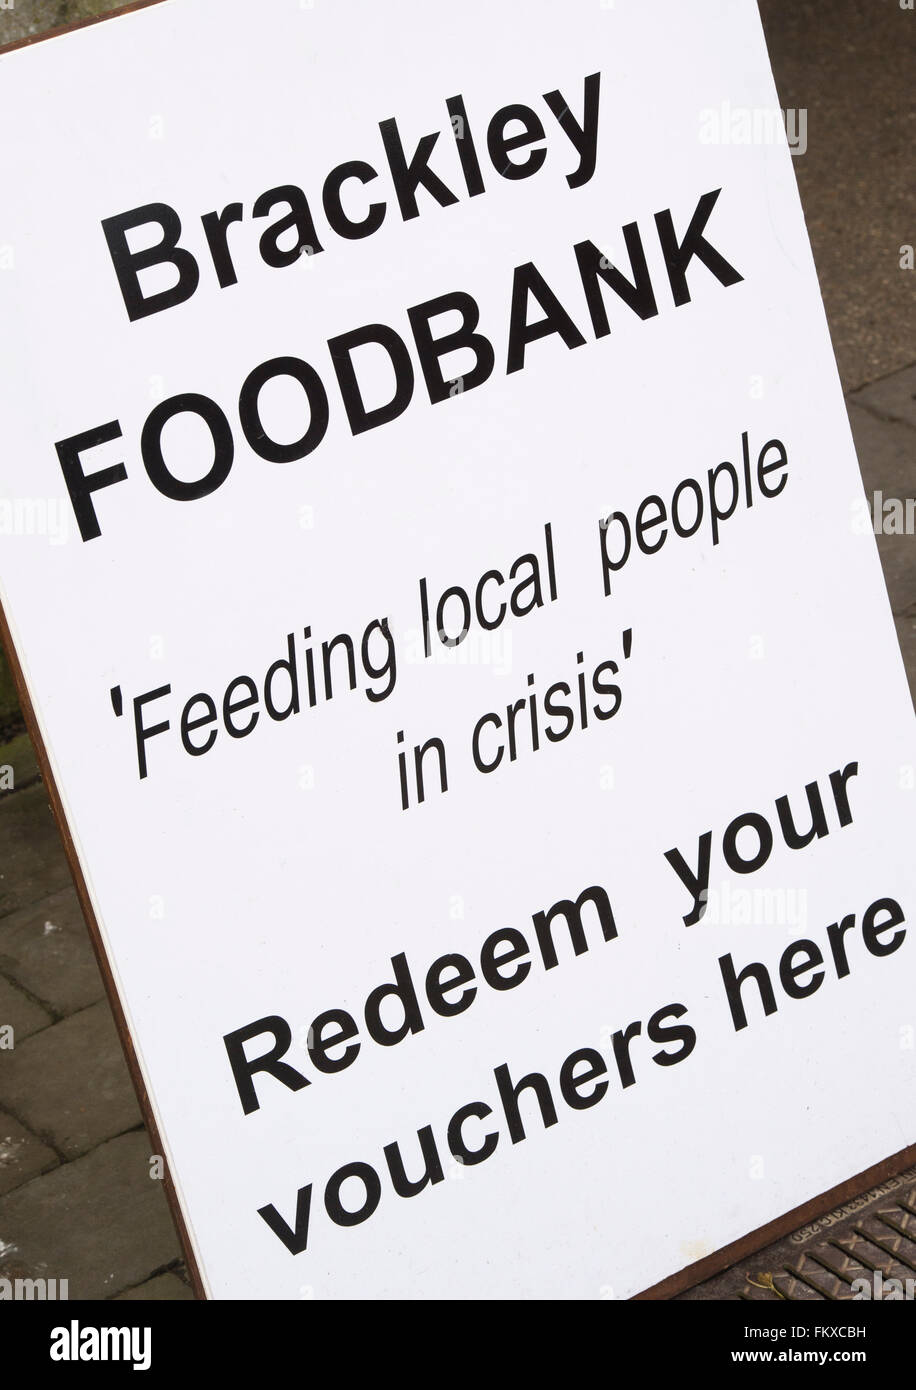 Brackley Foodbank sign. Northamptonshire, England - Stock Image